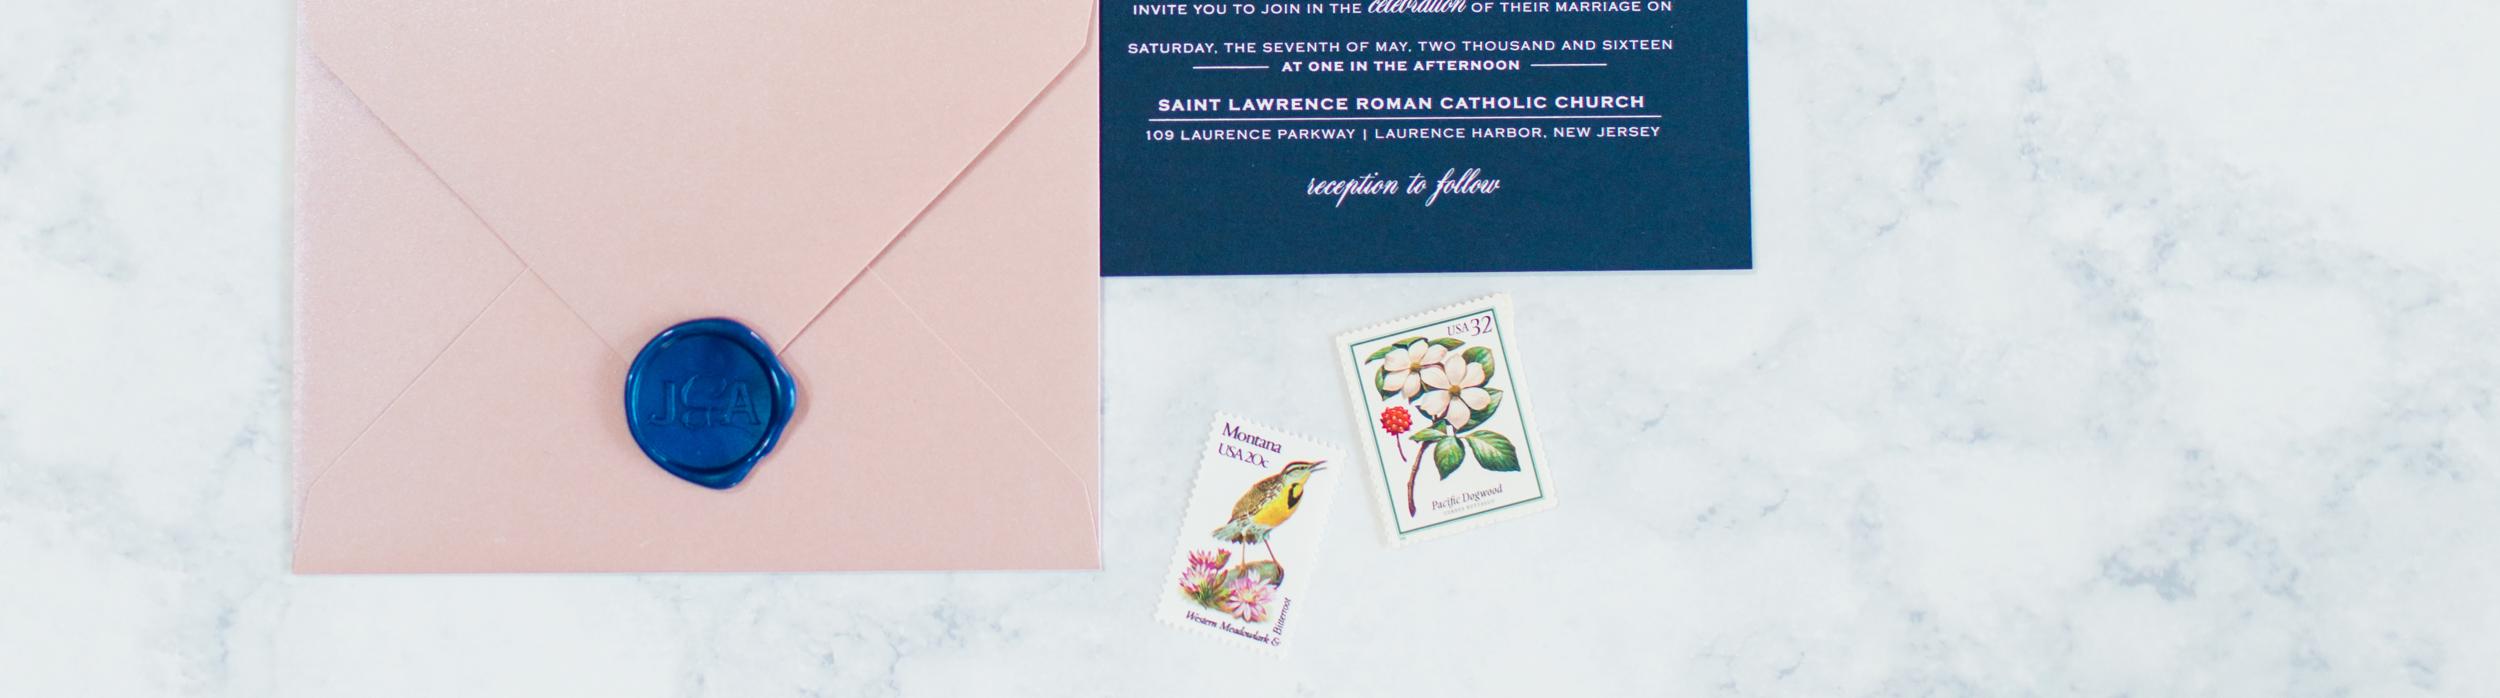 Princeton Wedding invitation Designer New York Wedding invitations Philly wedding invitation designer